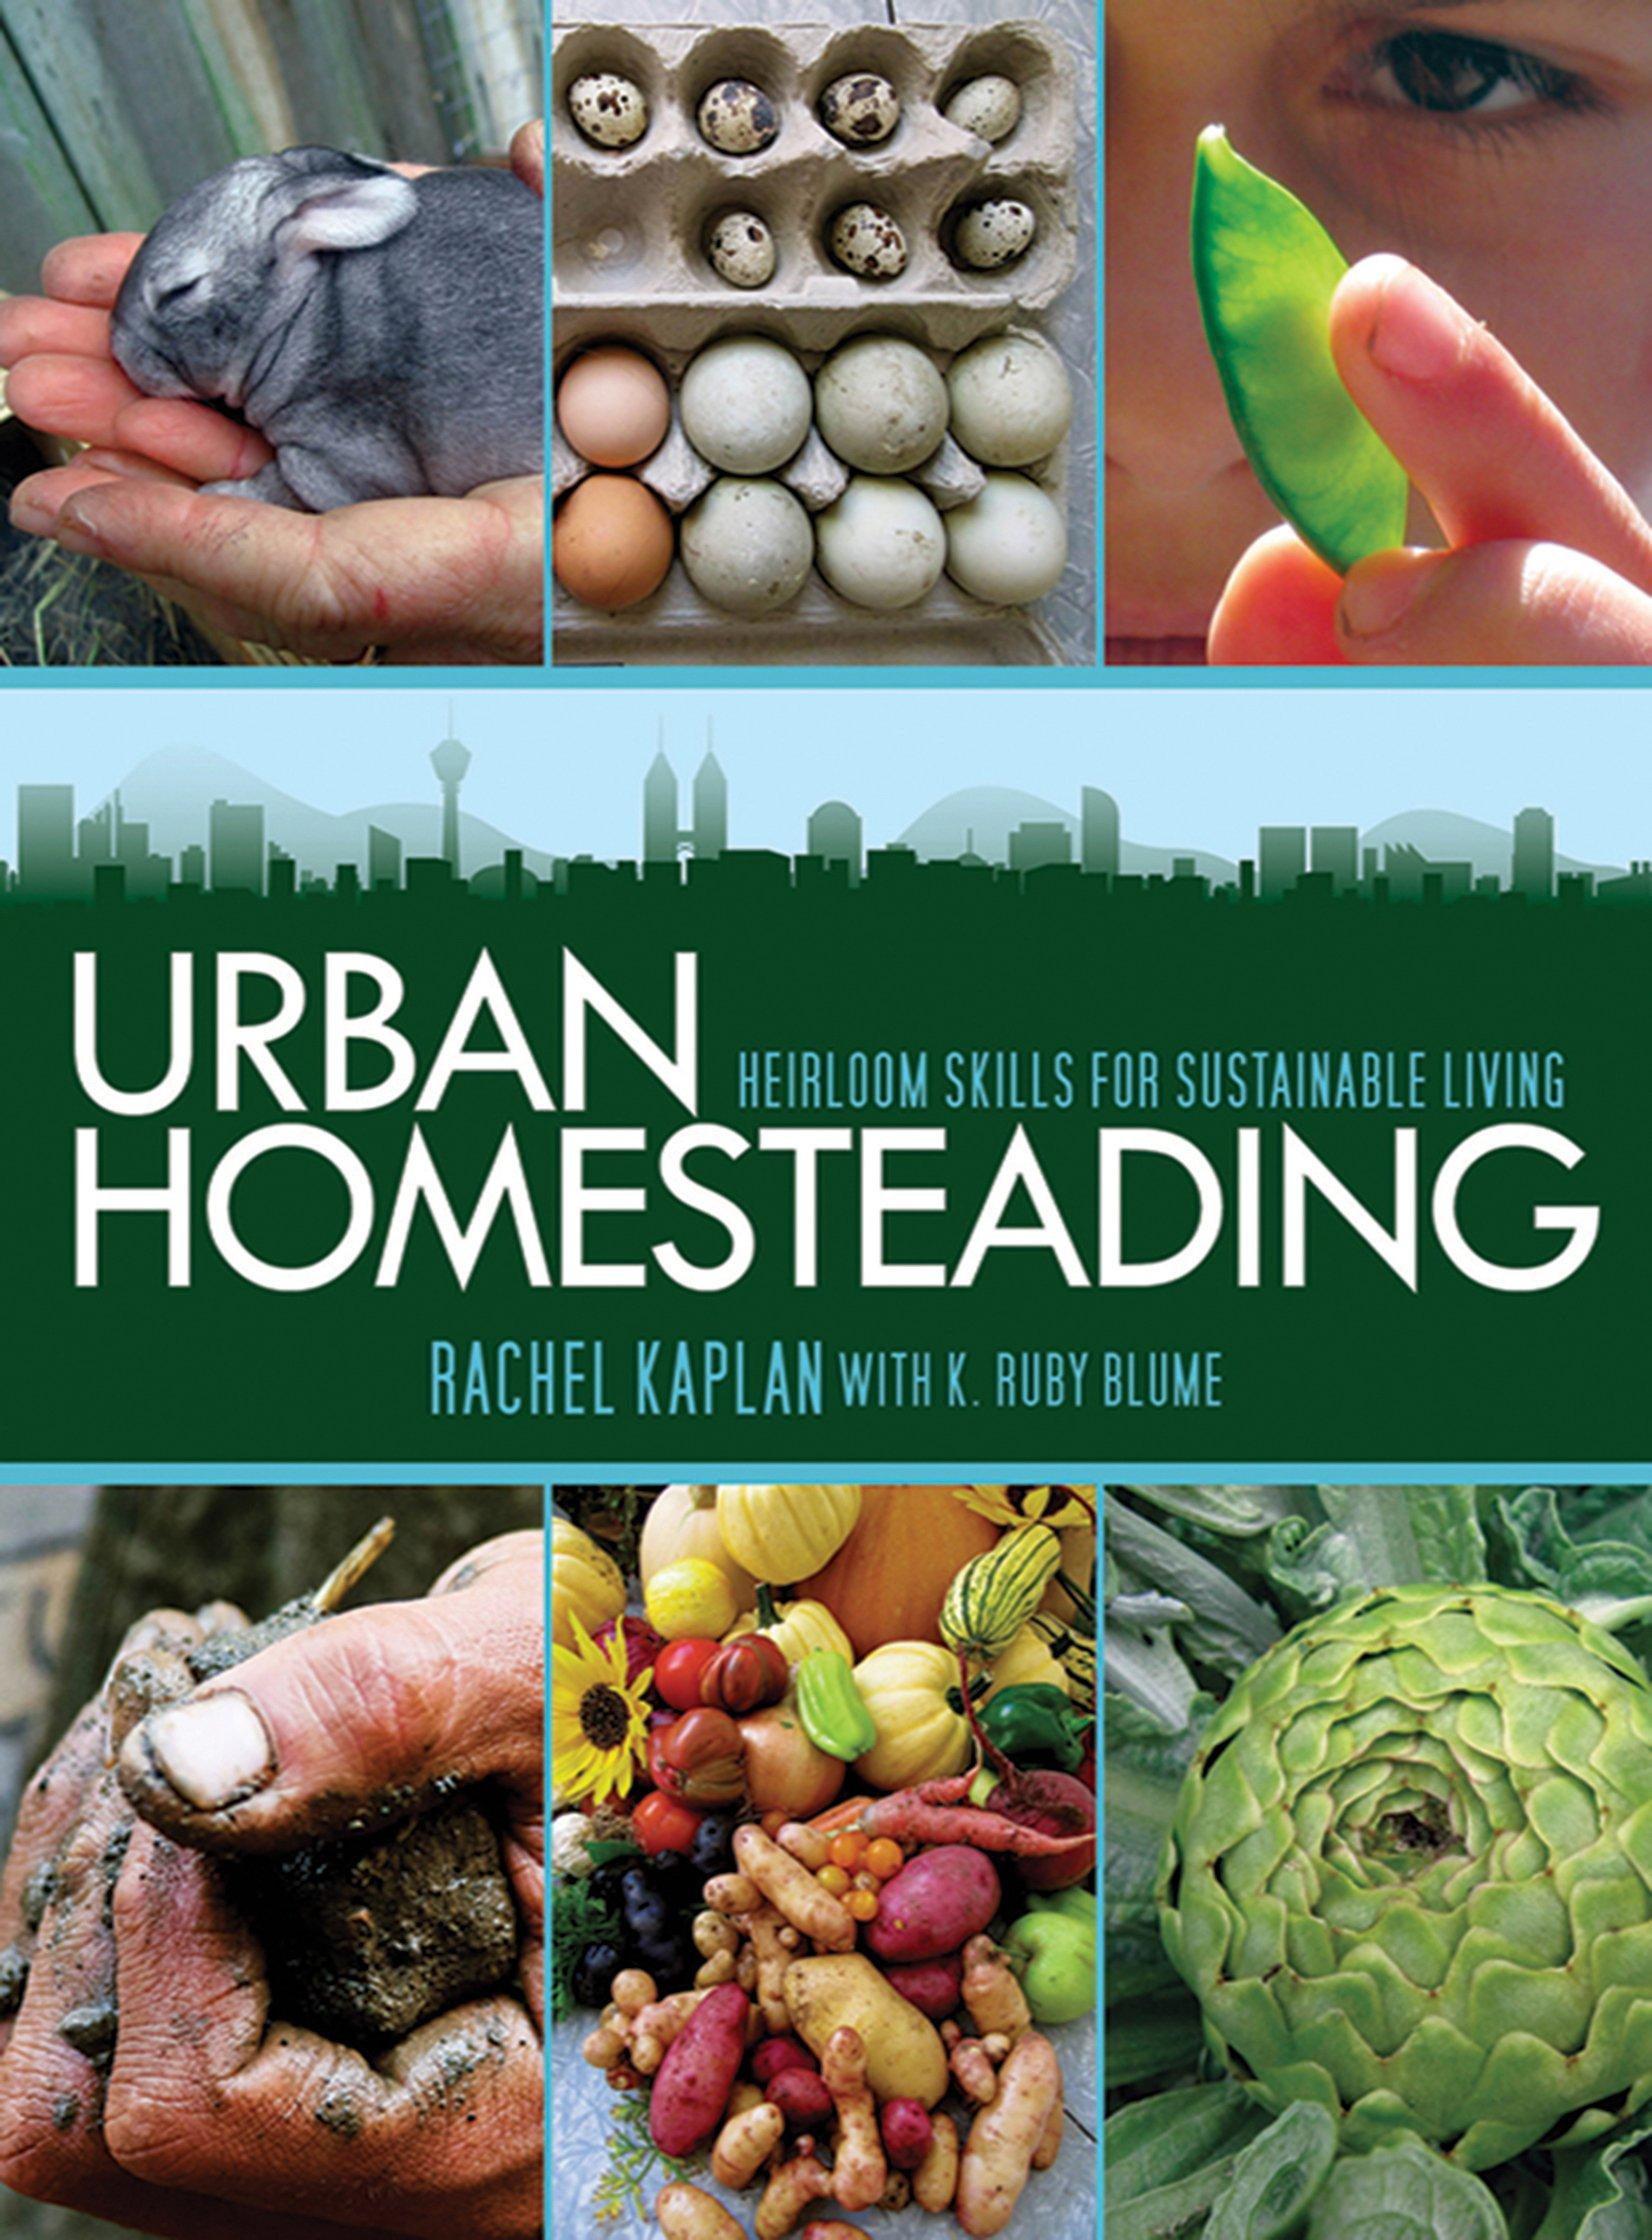 Urban Homesteading: Heirloom Skills for Sustainable Living